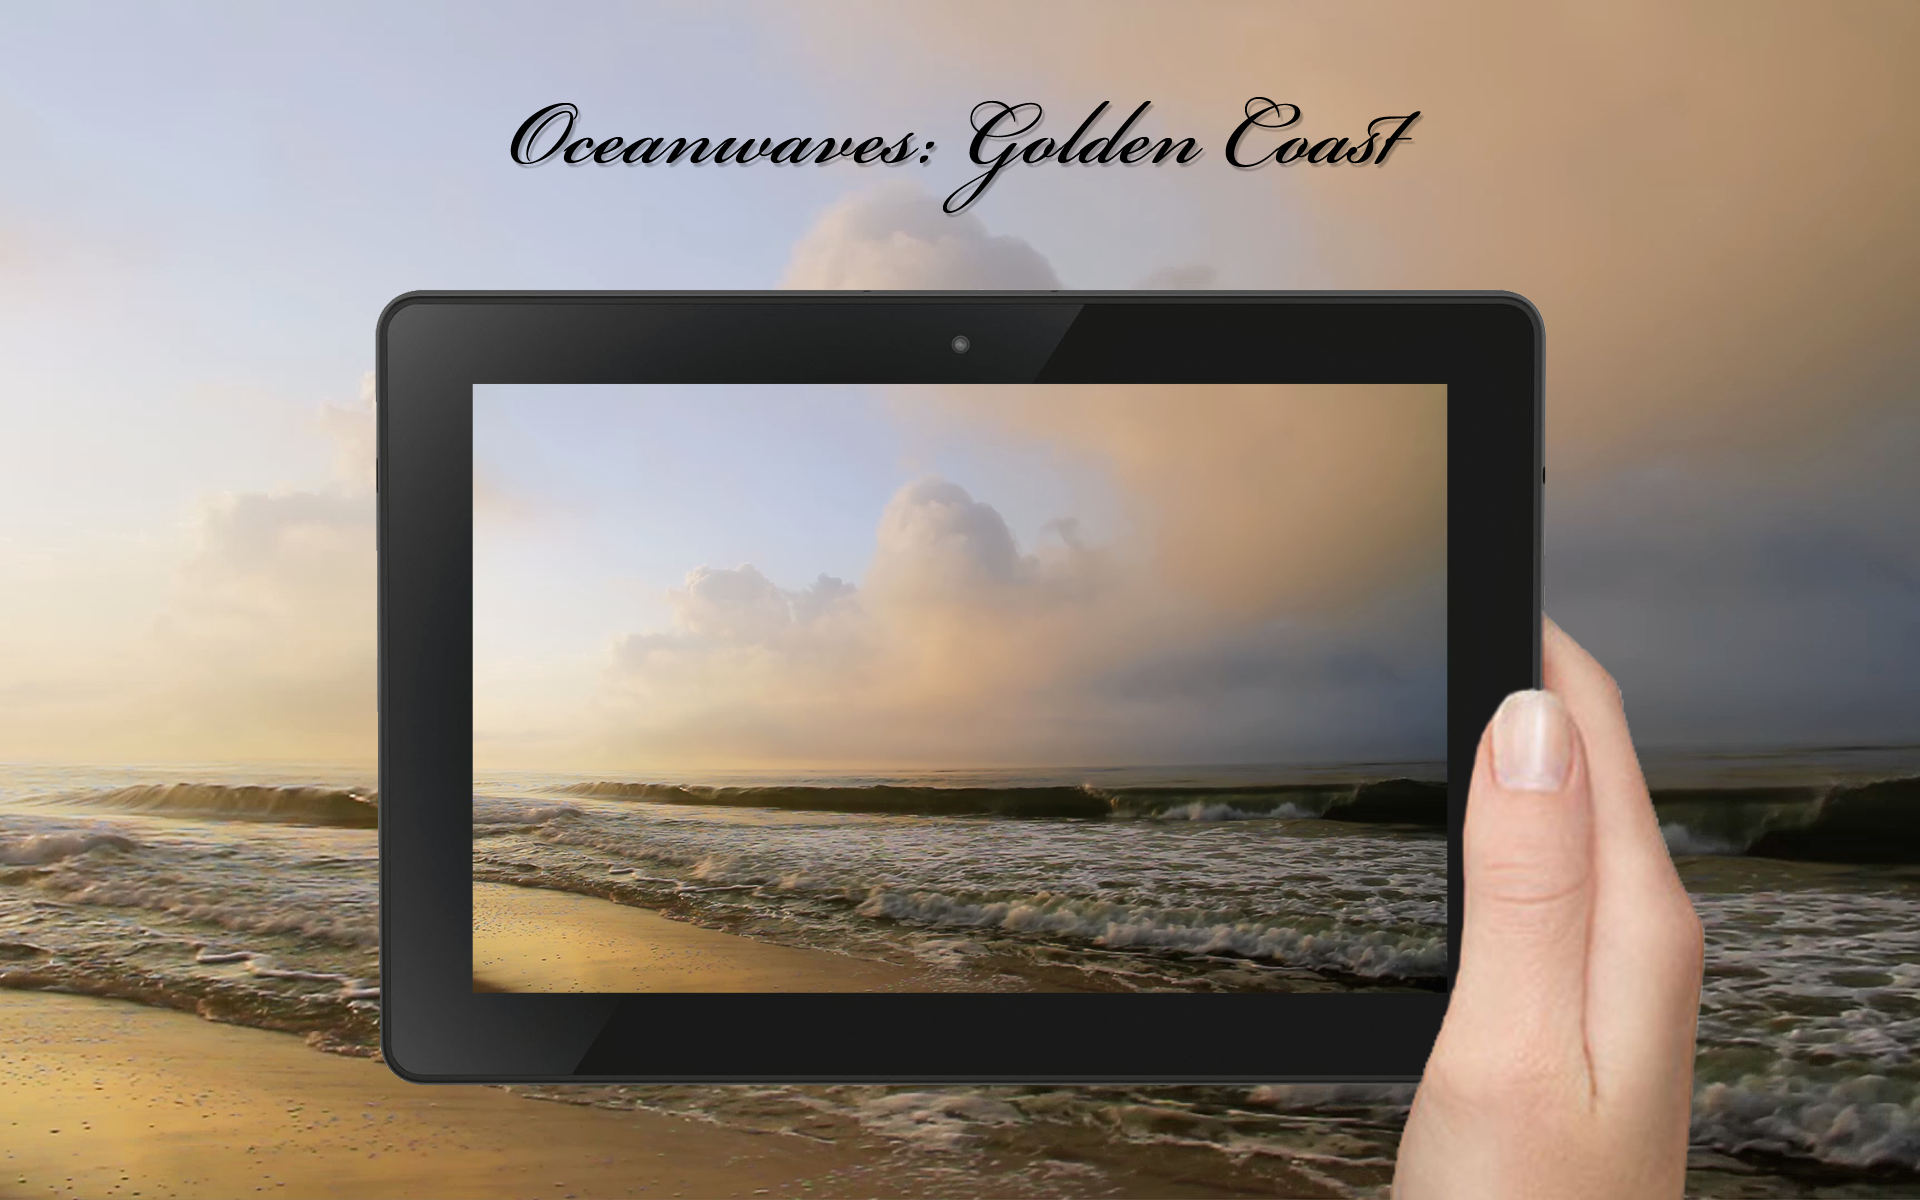 ocean waves sunglasses  ocean waves: golden coast